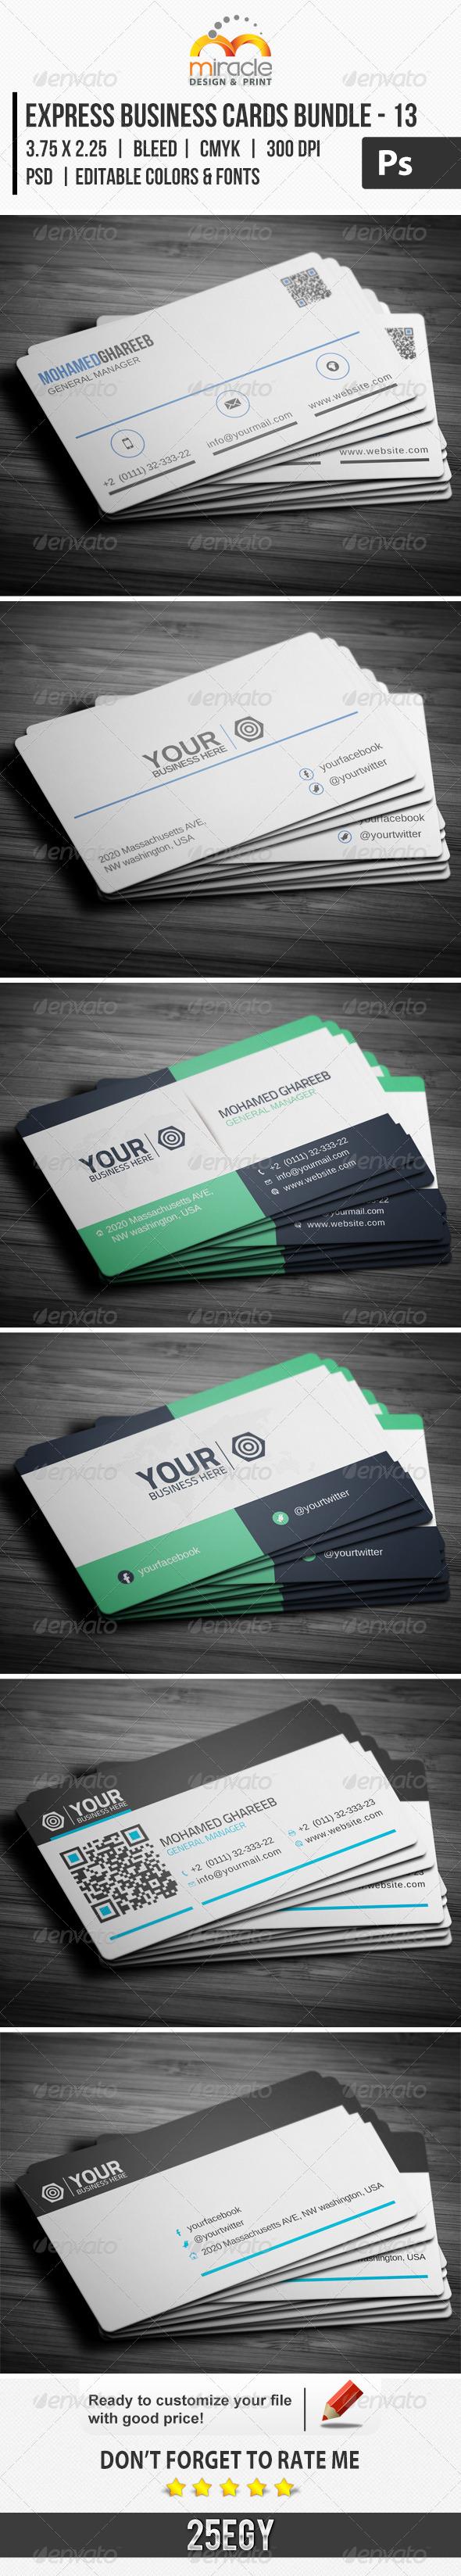 Express Business Cards Bundle 13